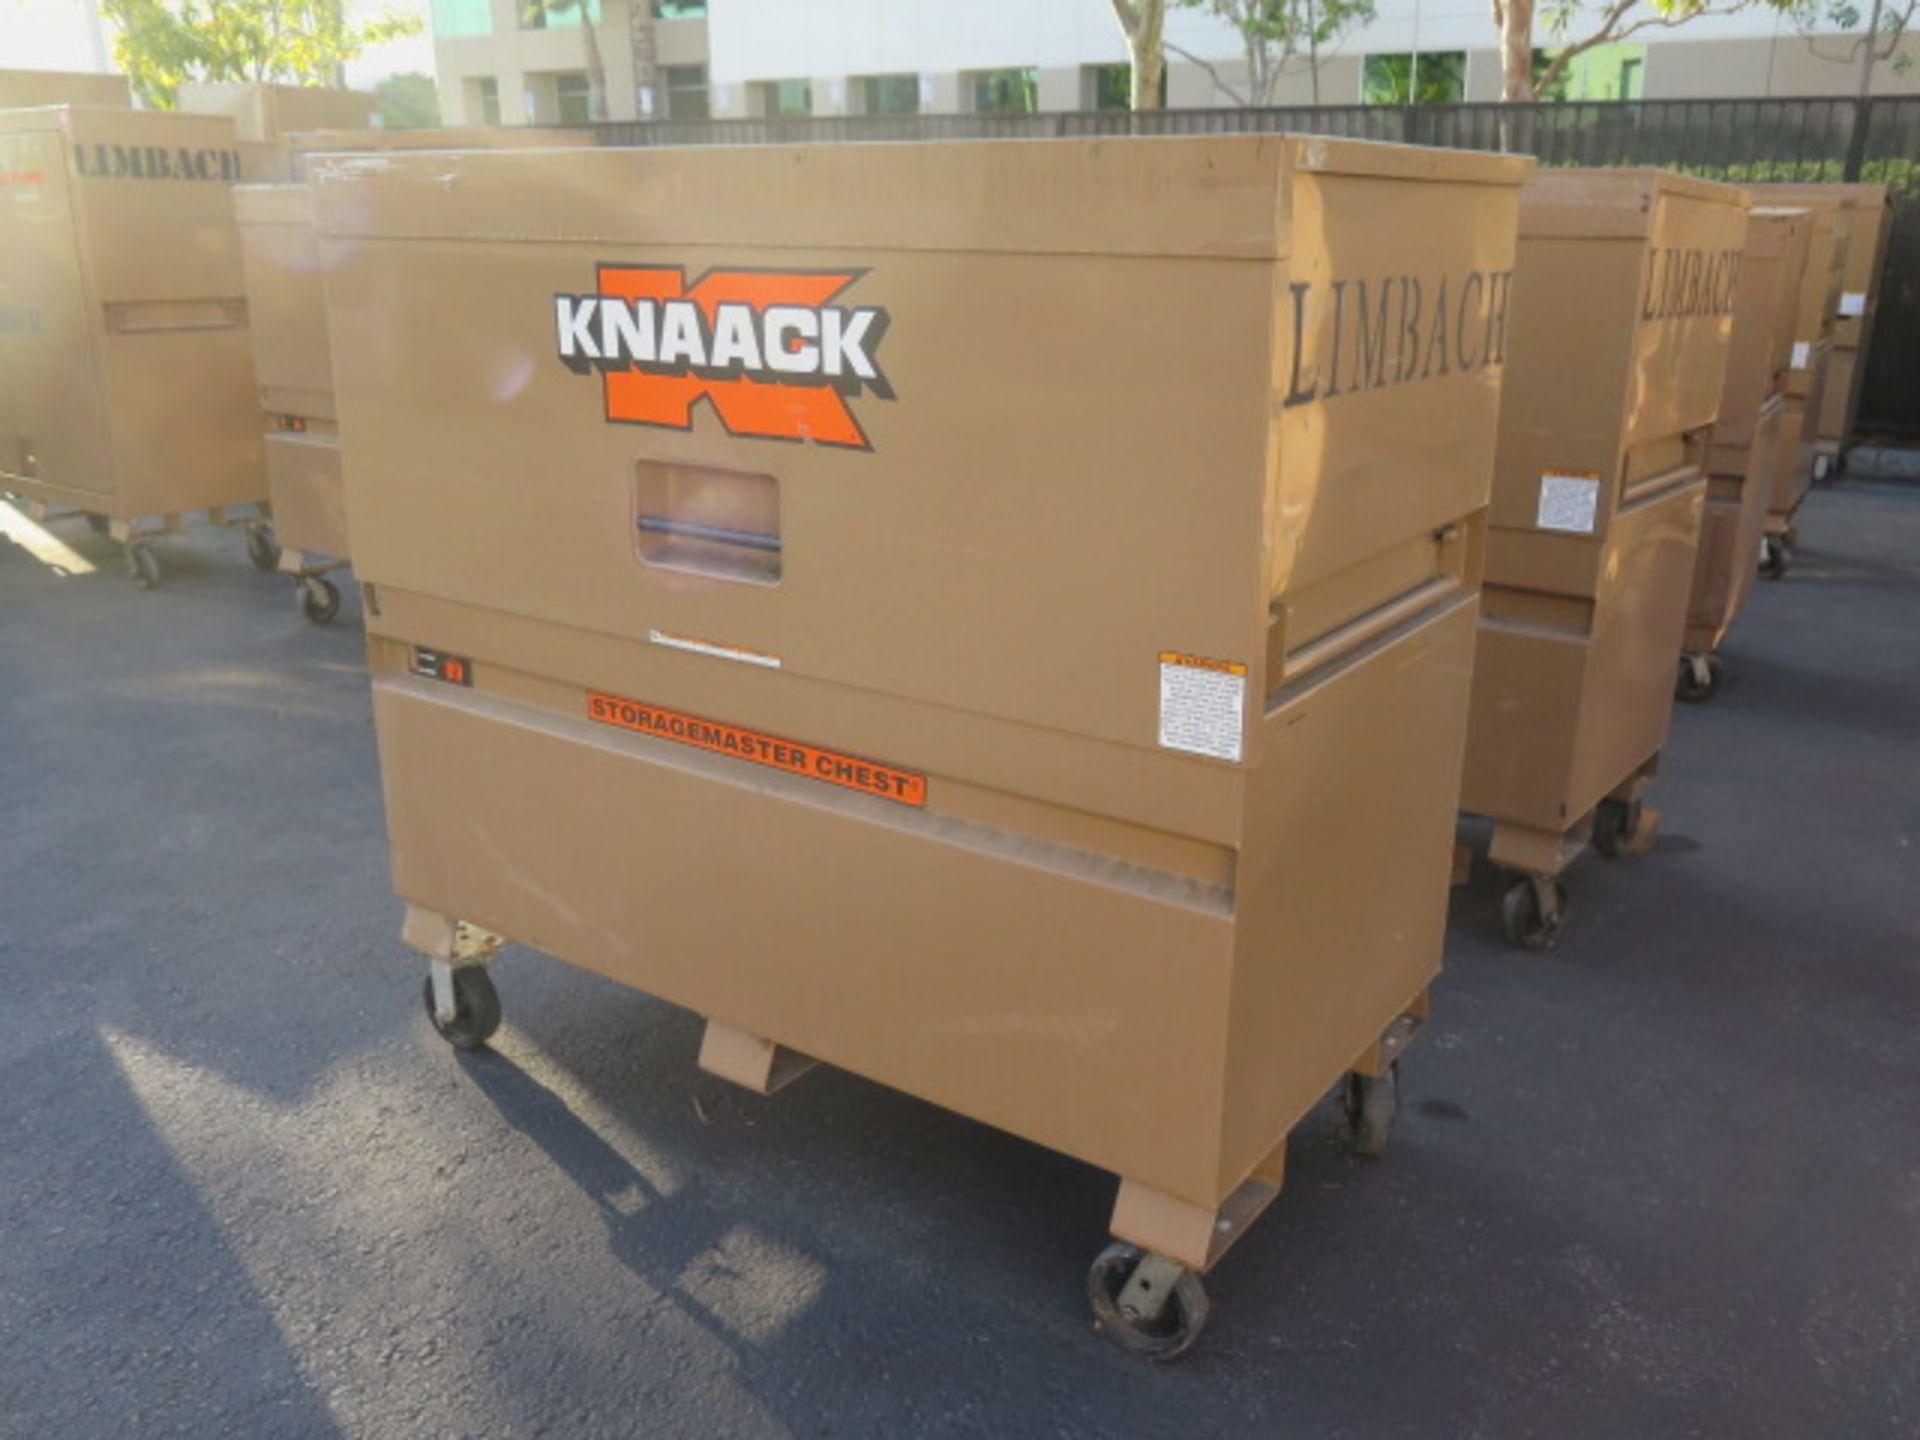 Knaack mdl. 89 Storagemaster Rolling Job Box w/ Come-Alongs (SOLD AS-IS - NO WARRANTY) - Image 2 of 12